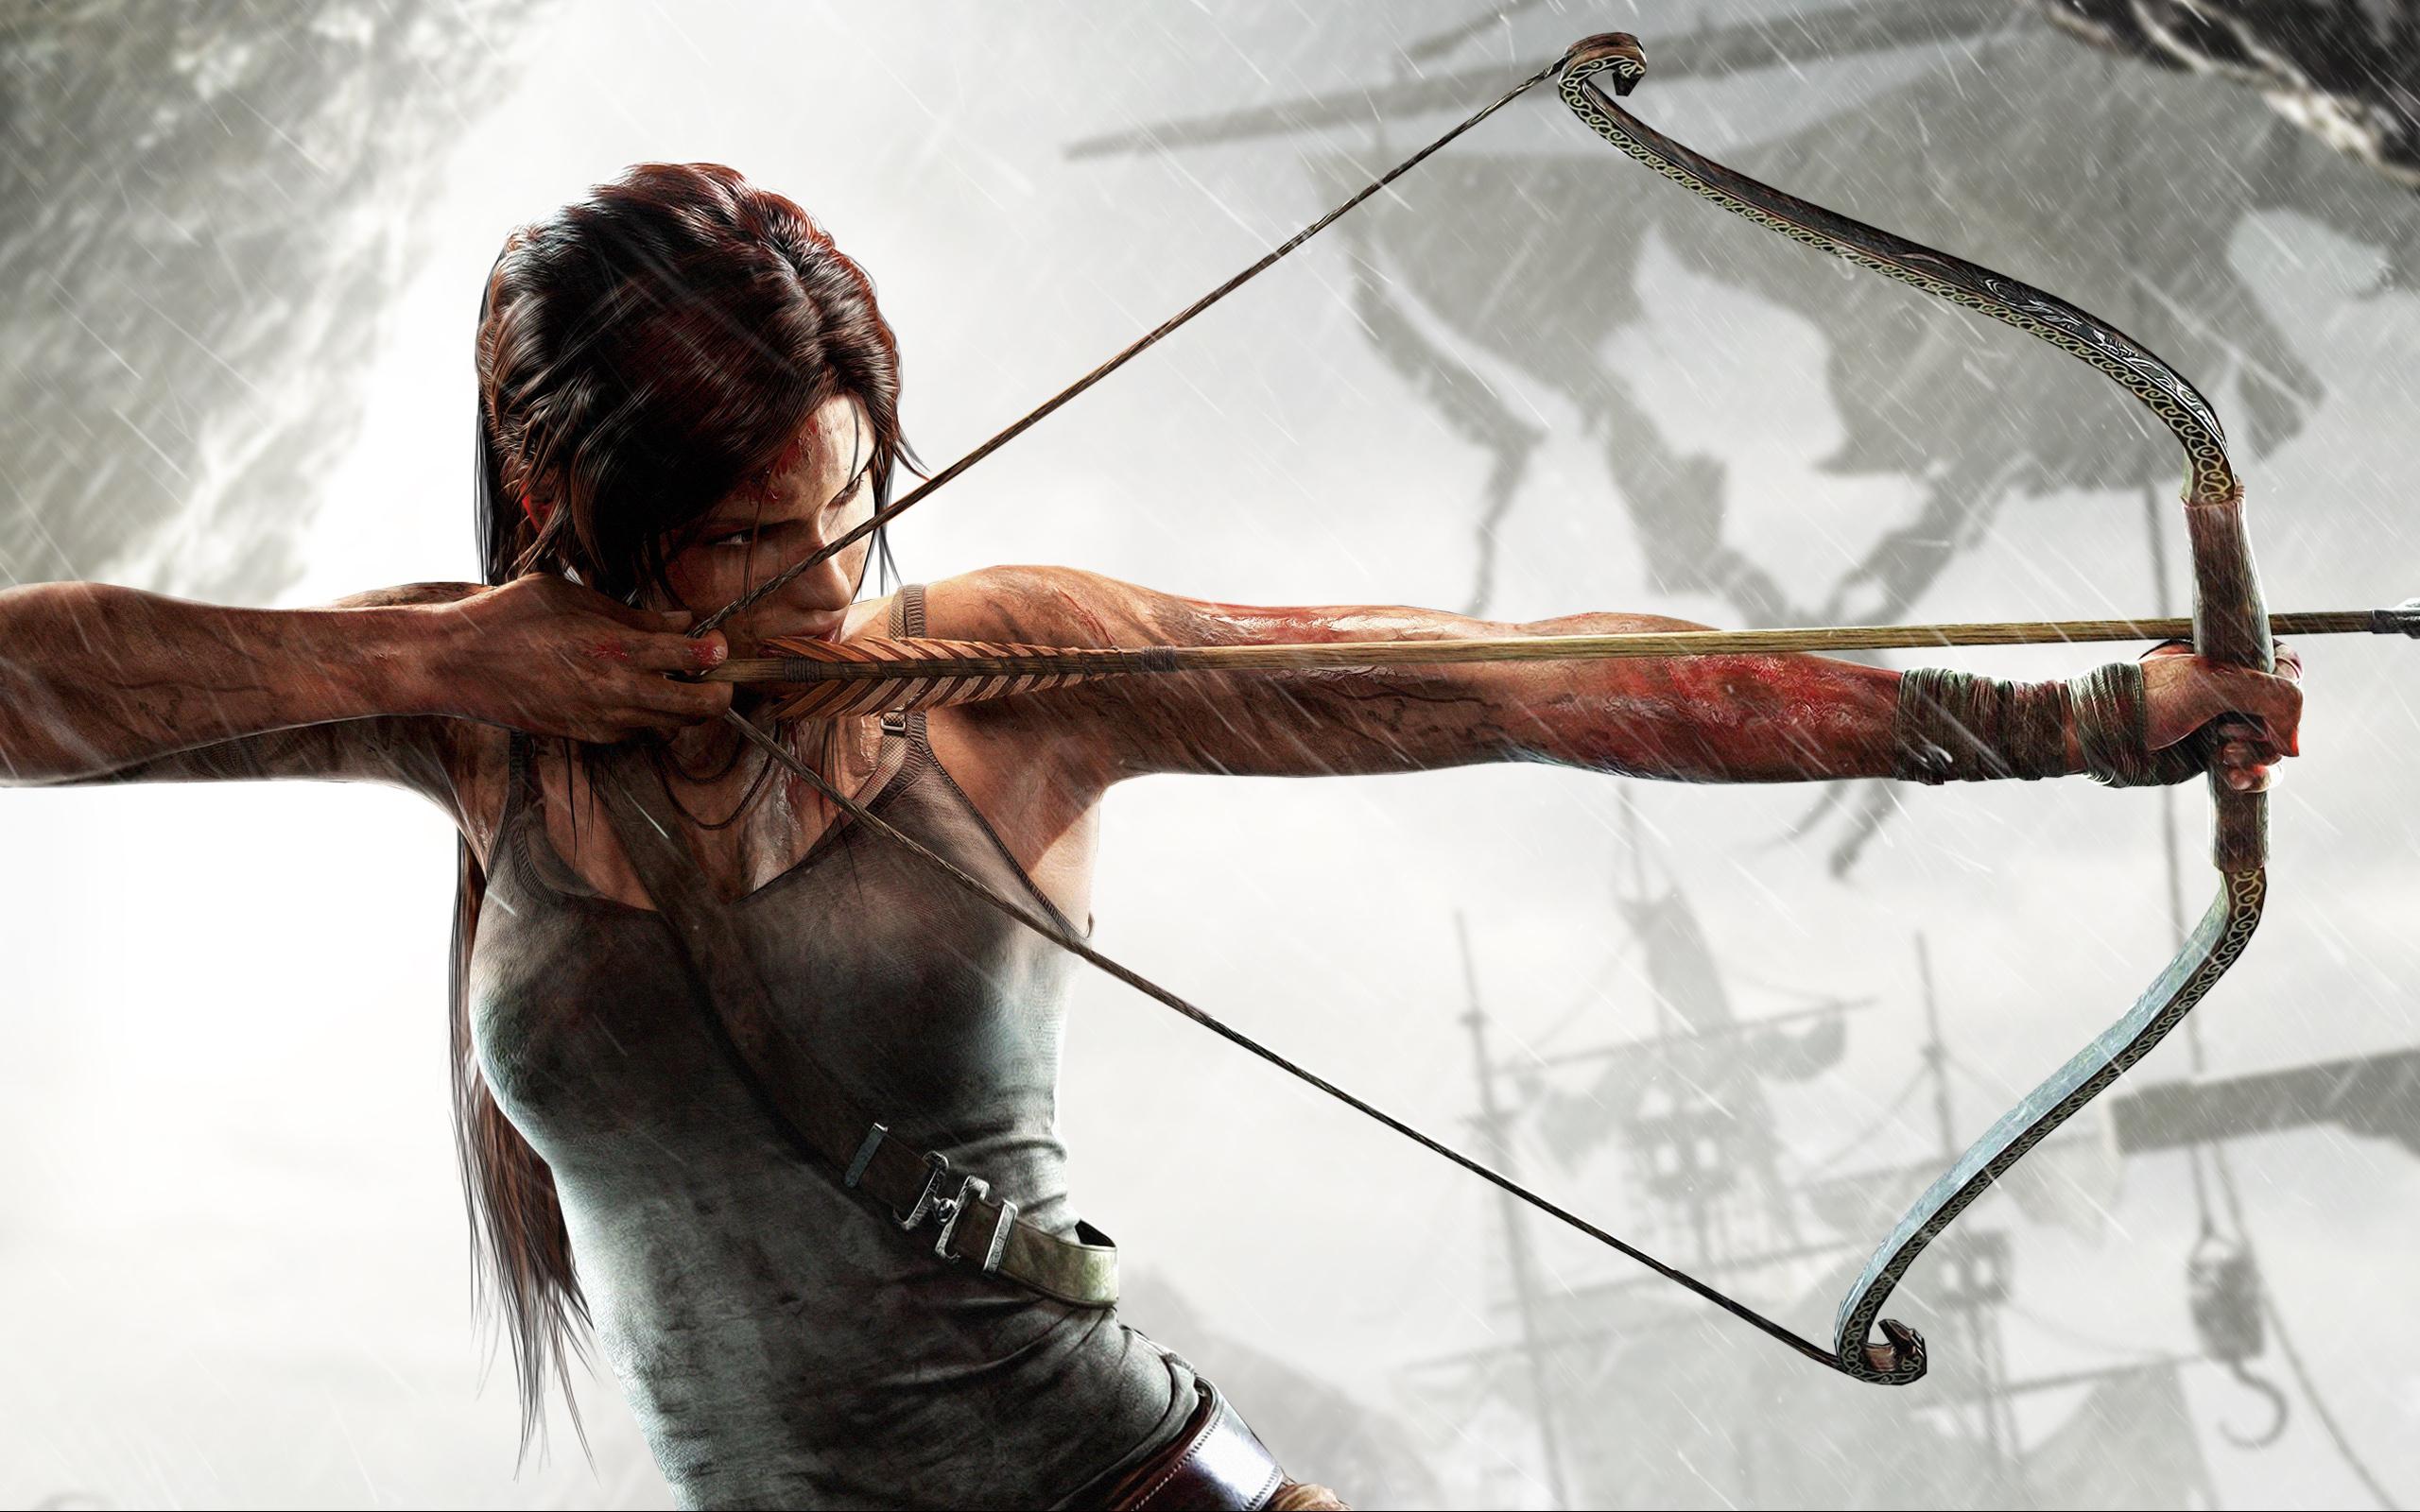 Tomb Raider 2013 Art Wallpapers HD Wallpapers 2560x1600